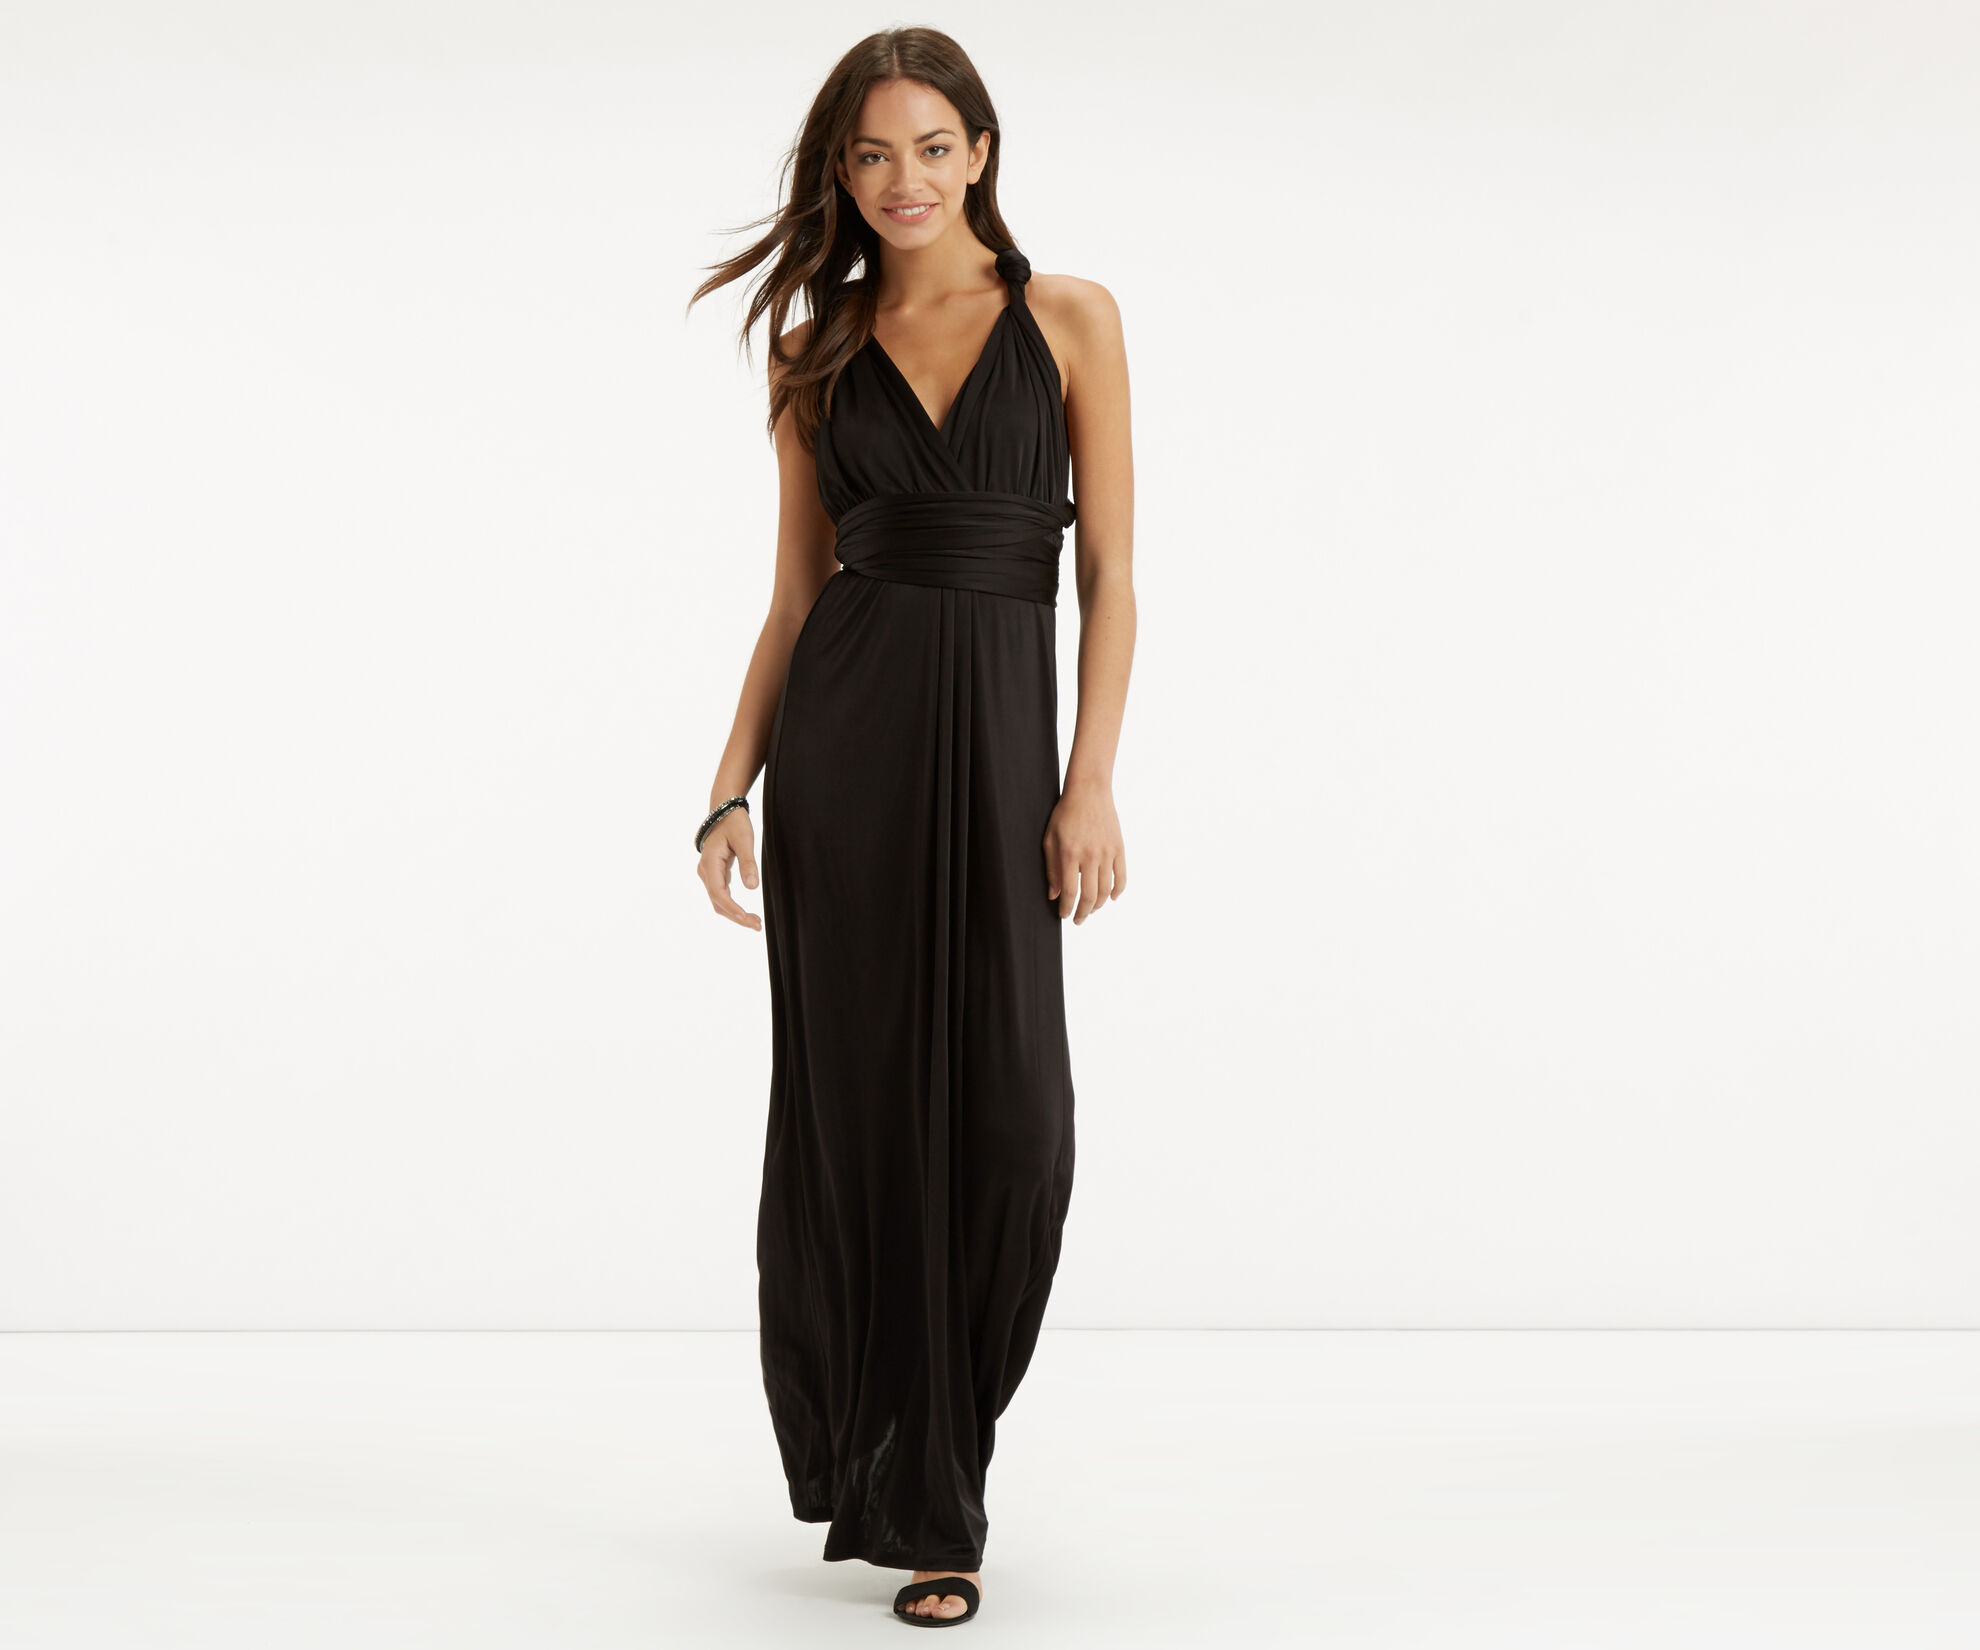 Oasis, The Wear it Your Way Dress Black 1